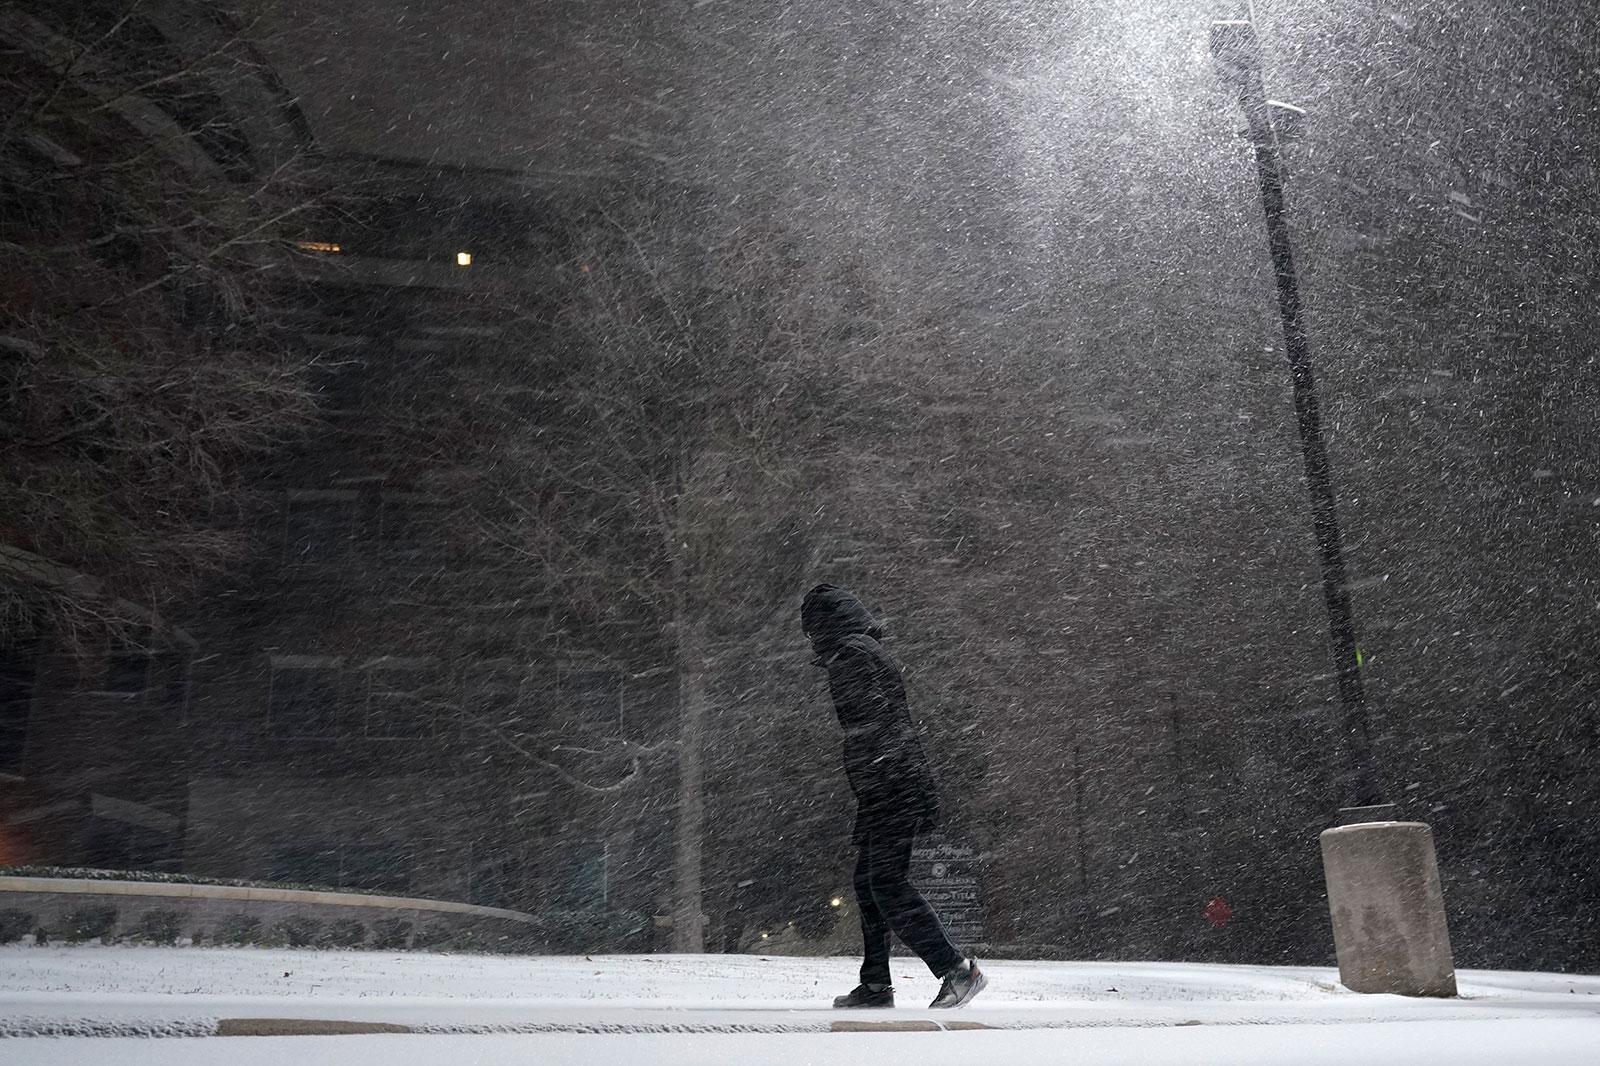 Snow falls in San Antonio, Texas, on February 14.